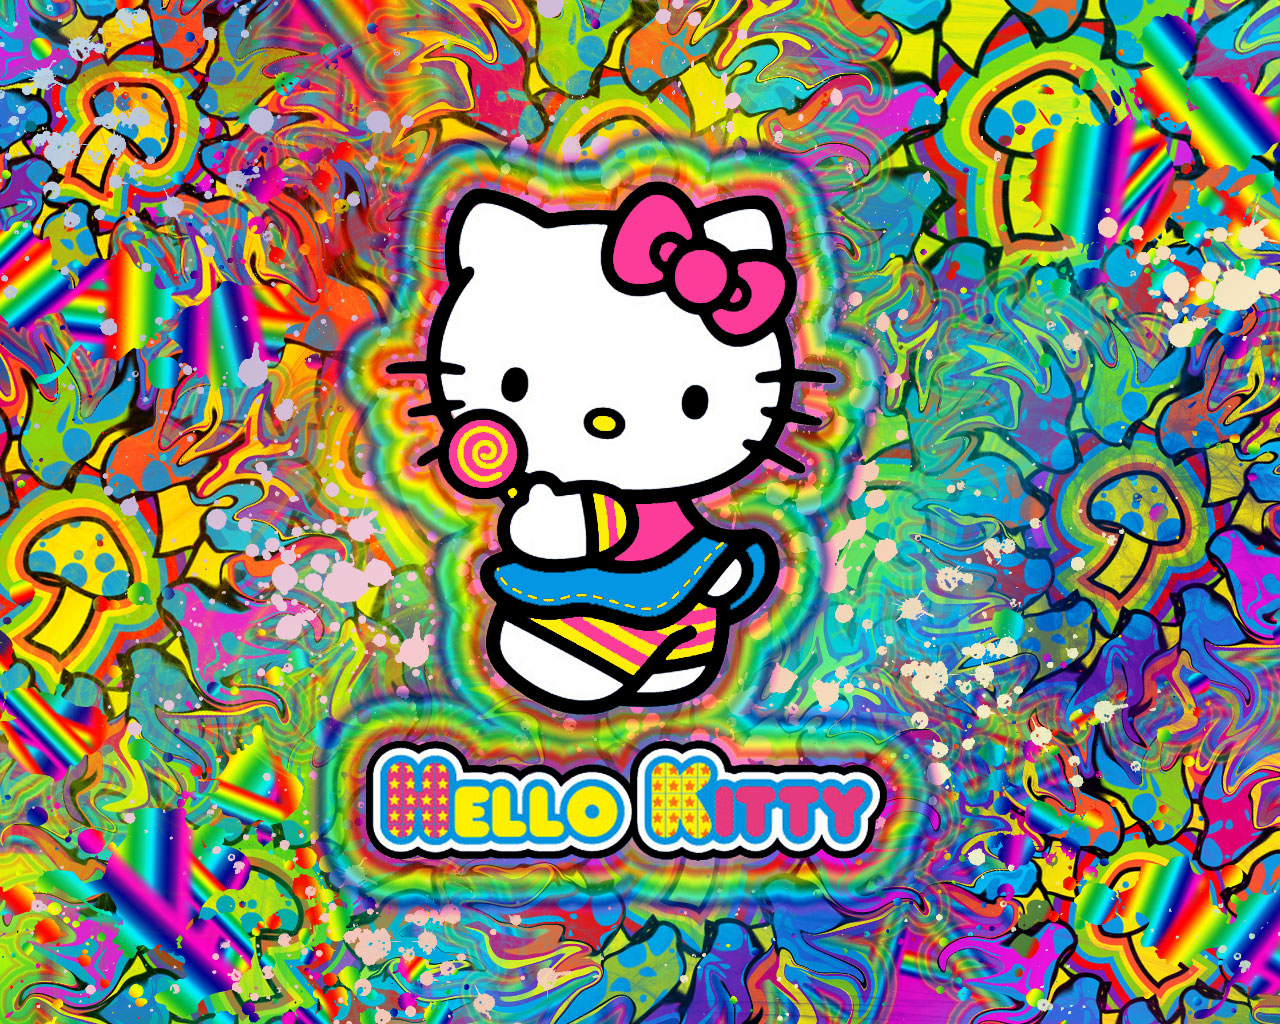 Hello Kitty Wallpapers #2